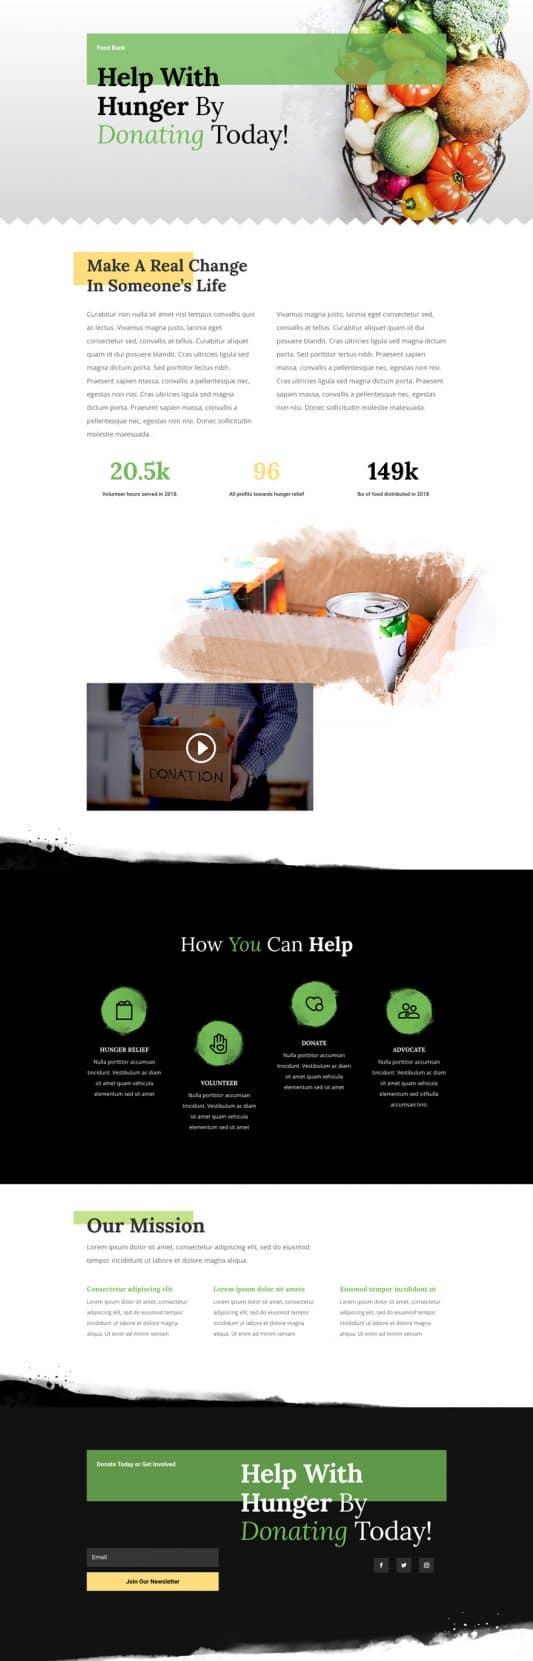 Food Bank Web Design 6